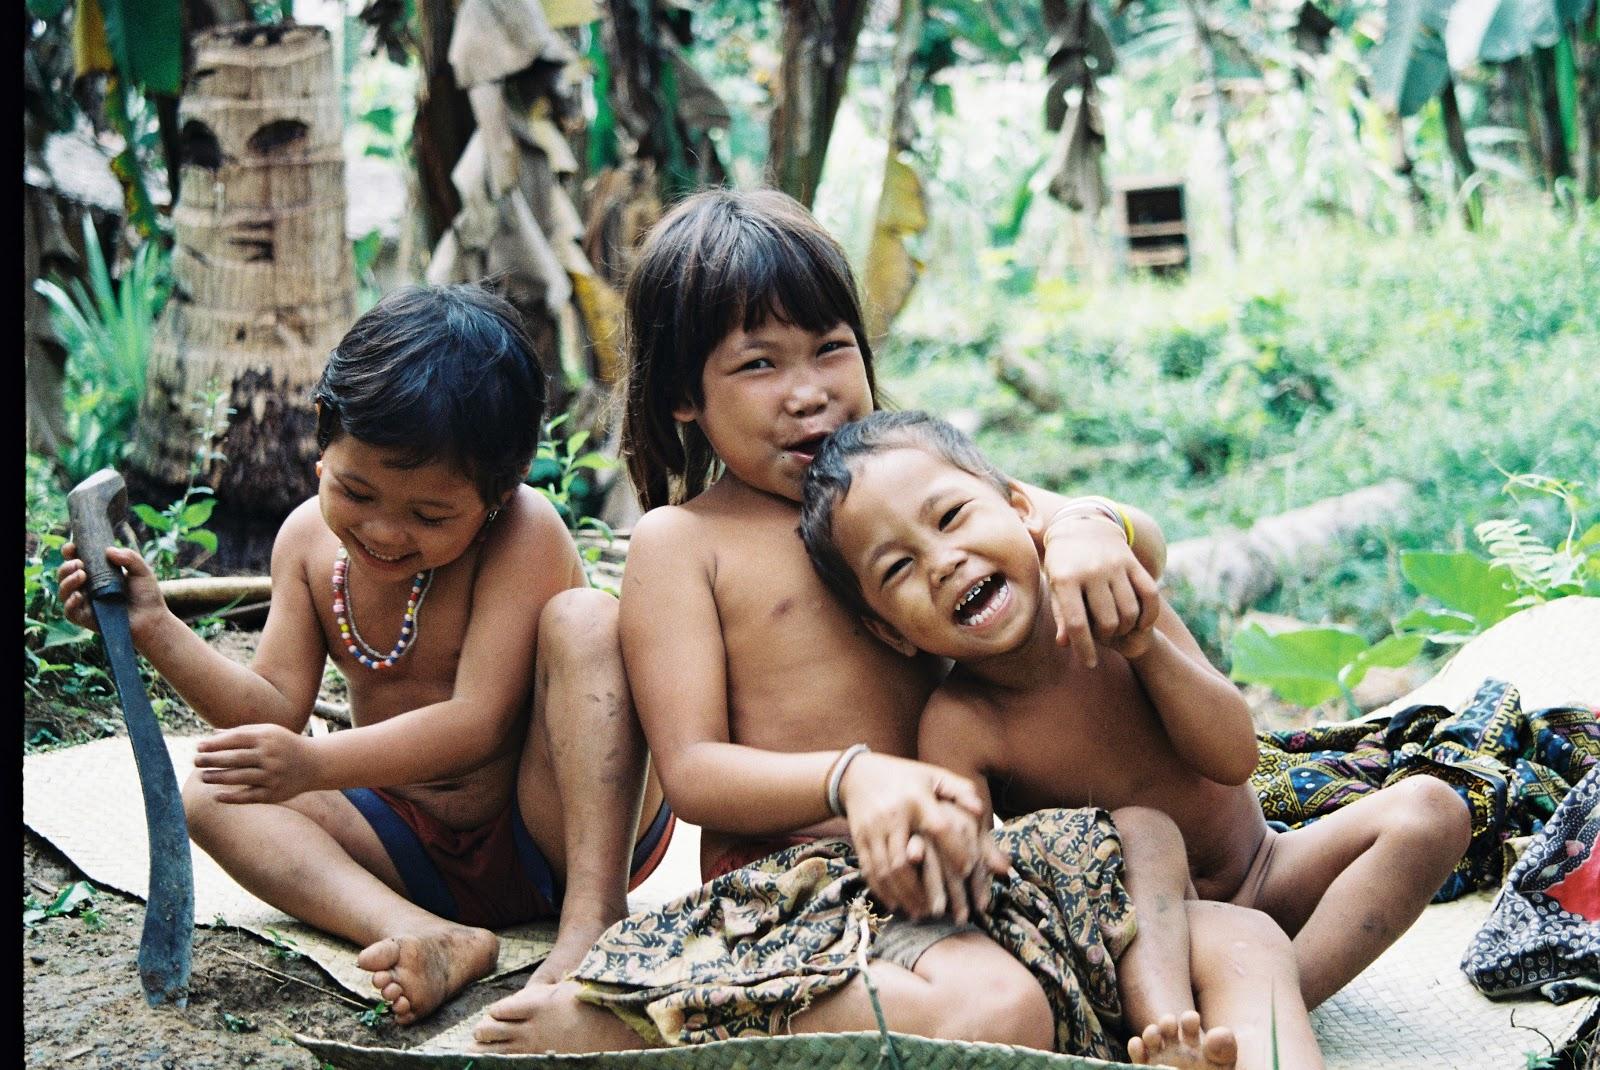 Anak Abg - Hot Photo | Tangerangwap™